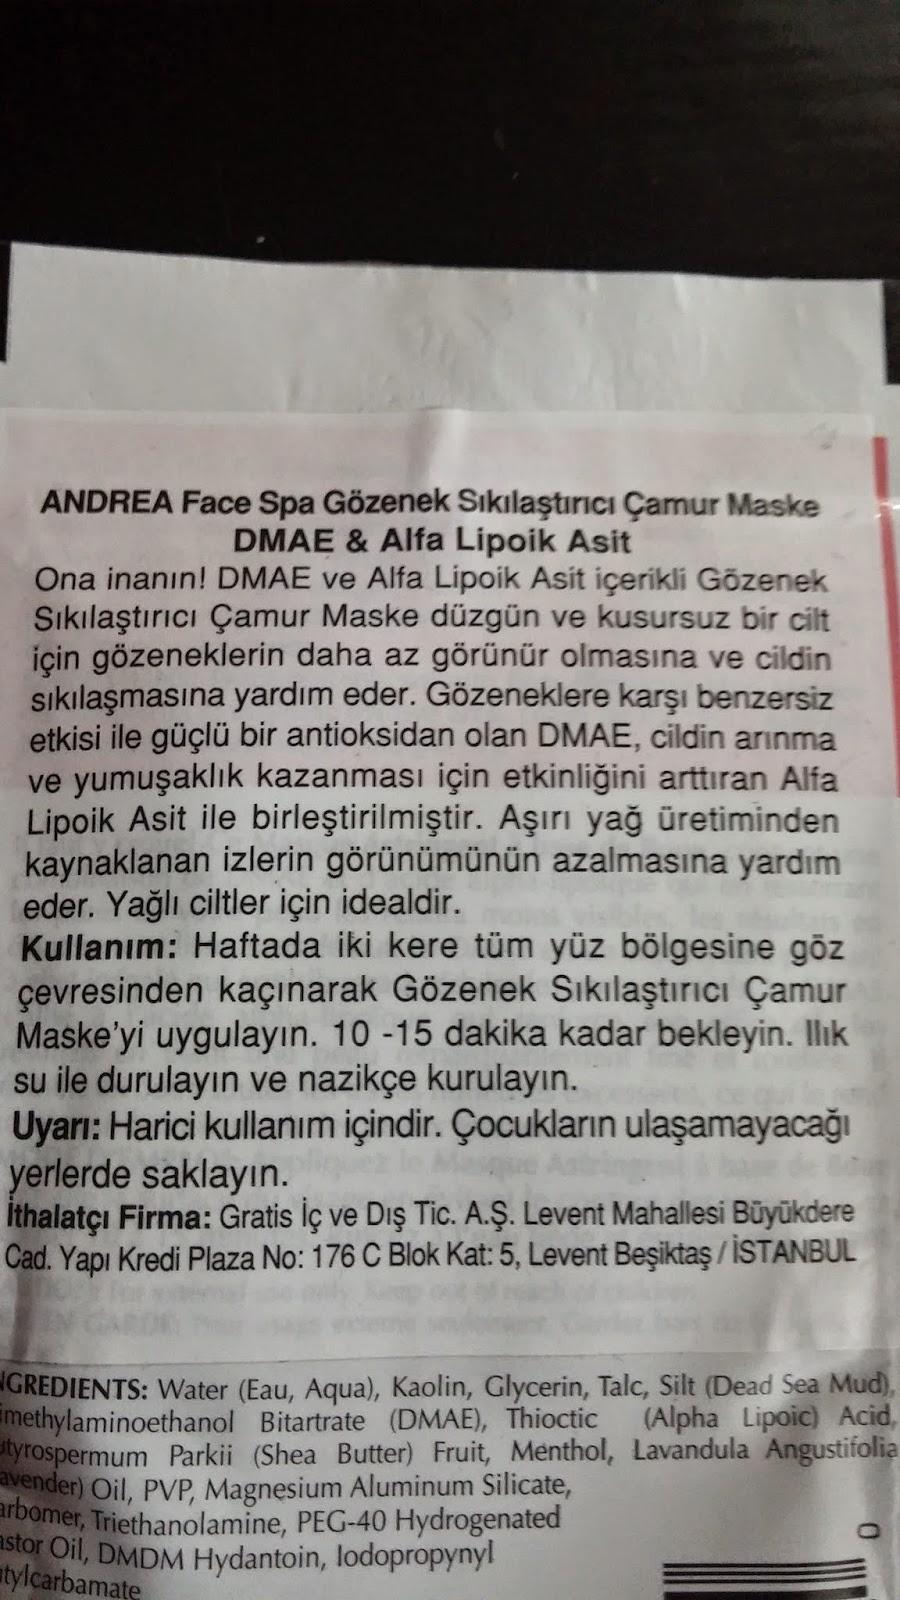 Andrea Face Spa